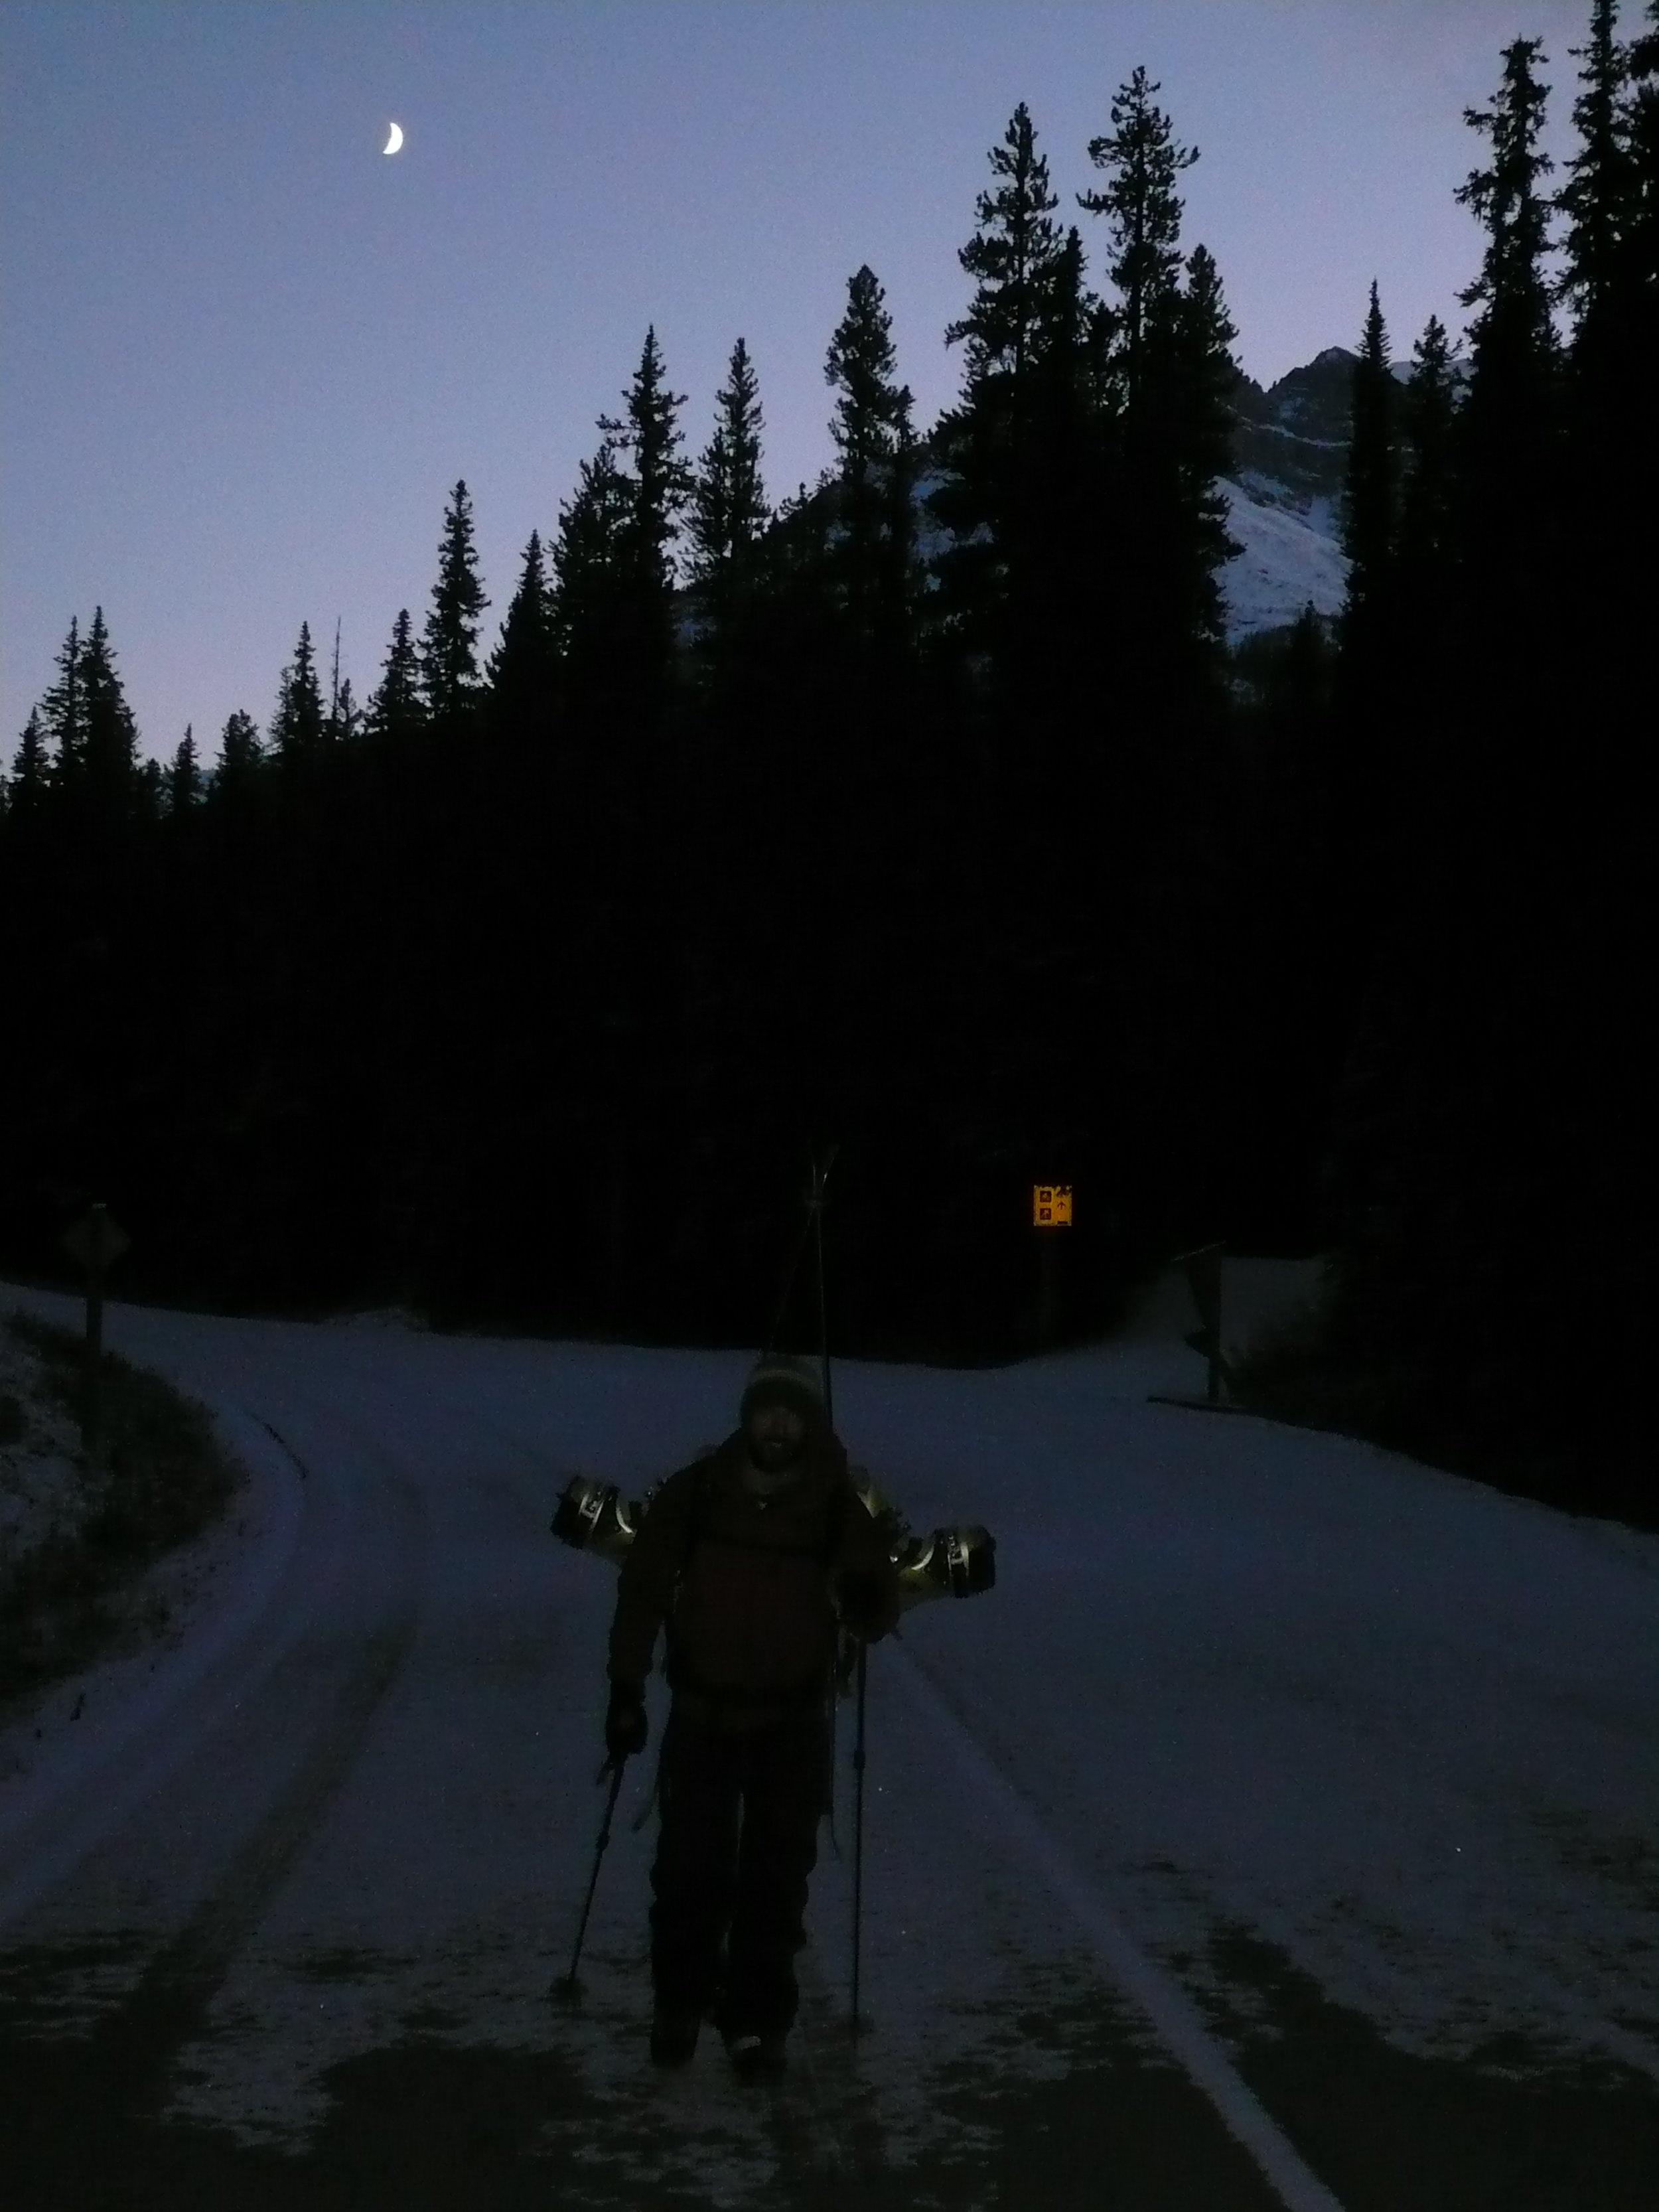 Lefebvre walks the road home in the dark